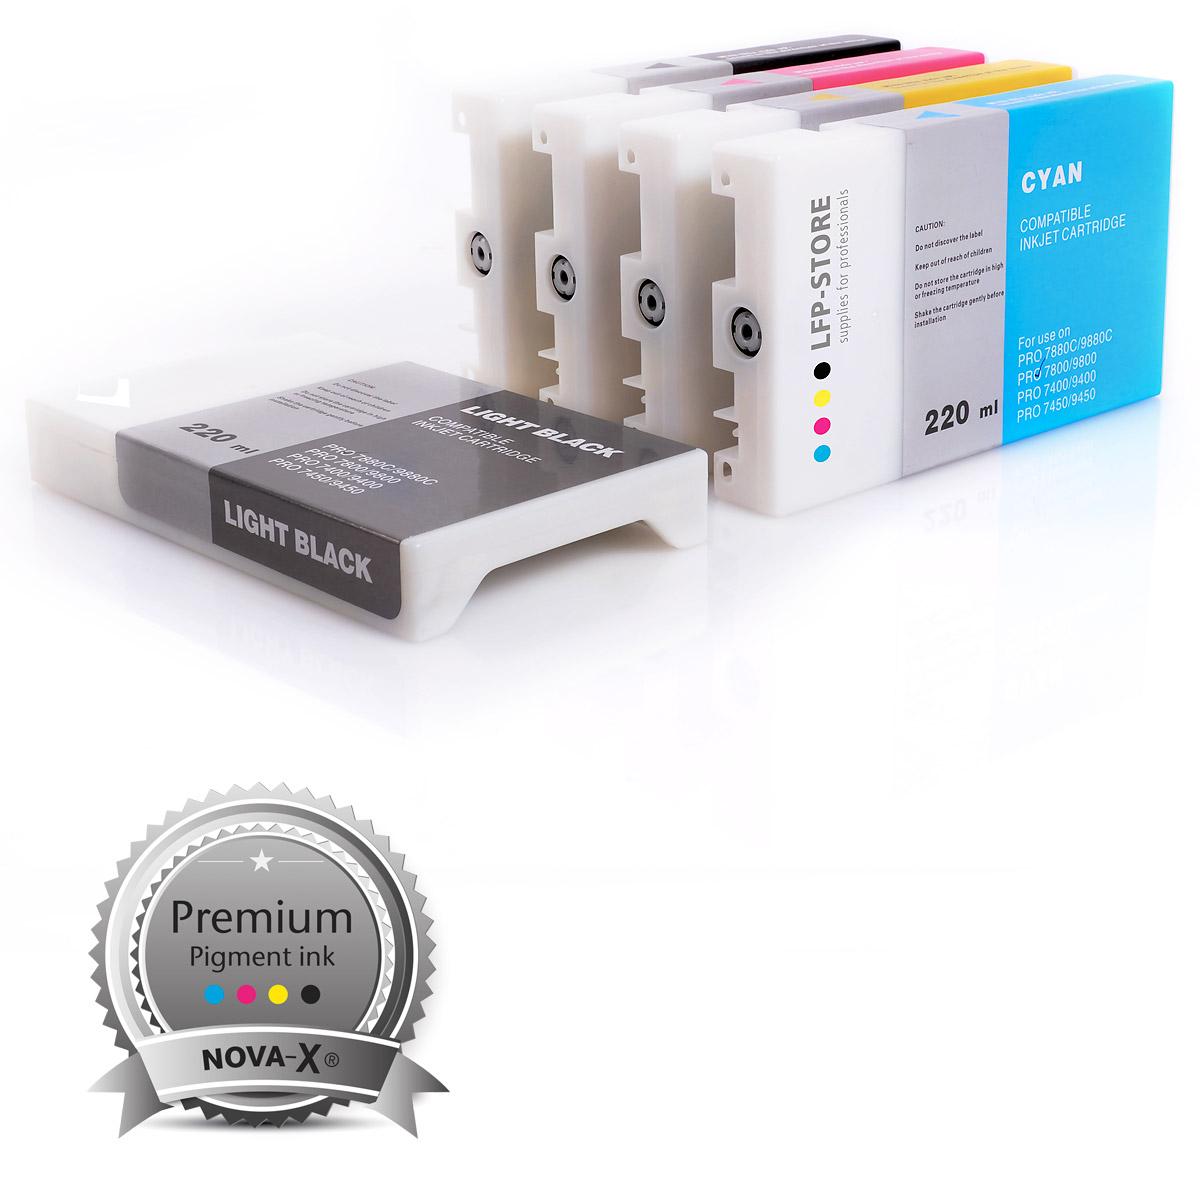 Tintenpatrone 220ml NOVA-X® K3 kompatibel für Epson® Stylus Pro 7800 | 9800